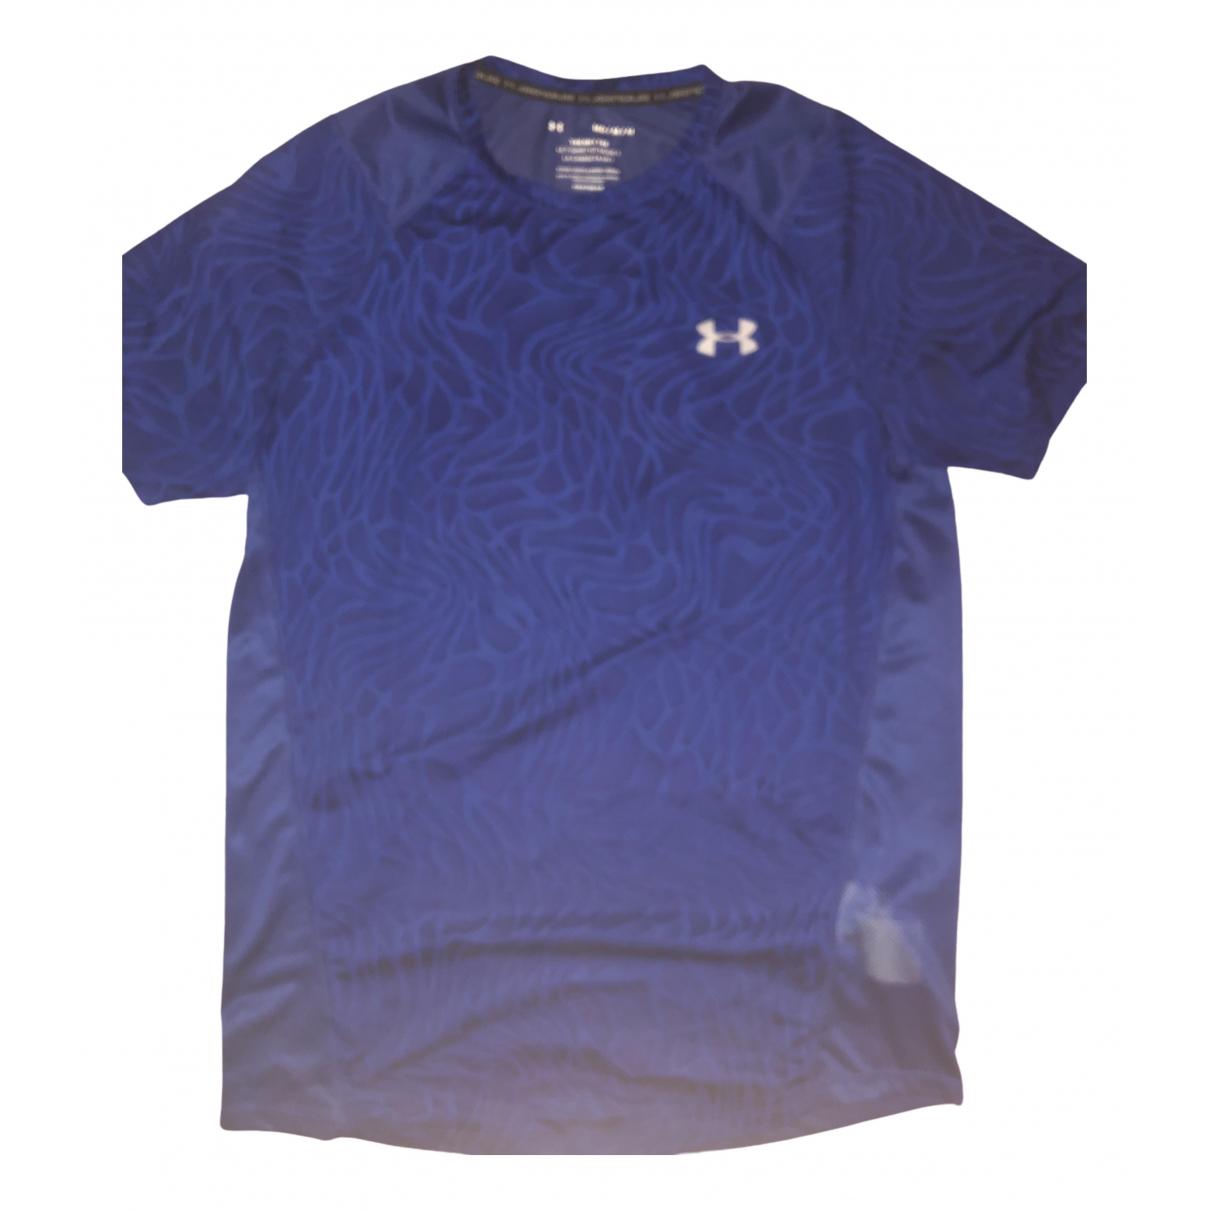 Under Armour \N Blue T-shirts for Men M International